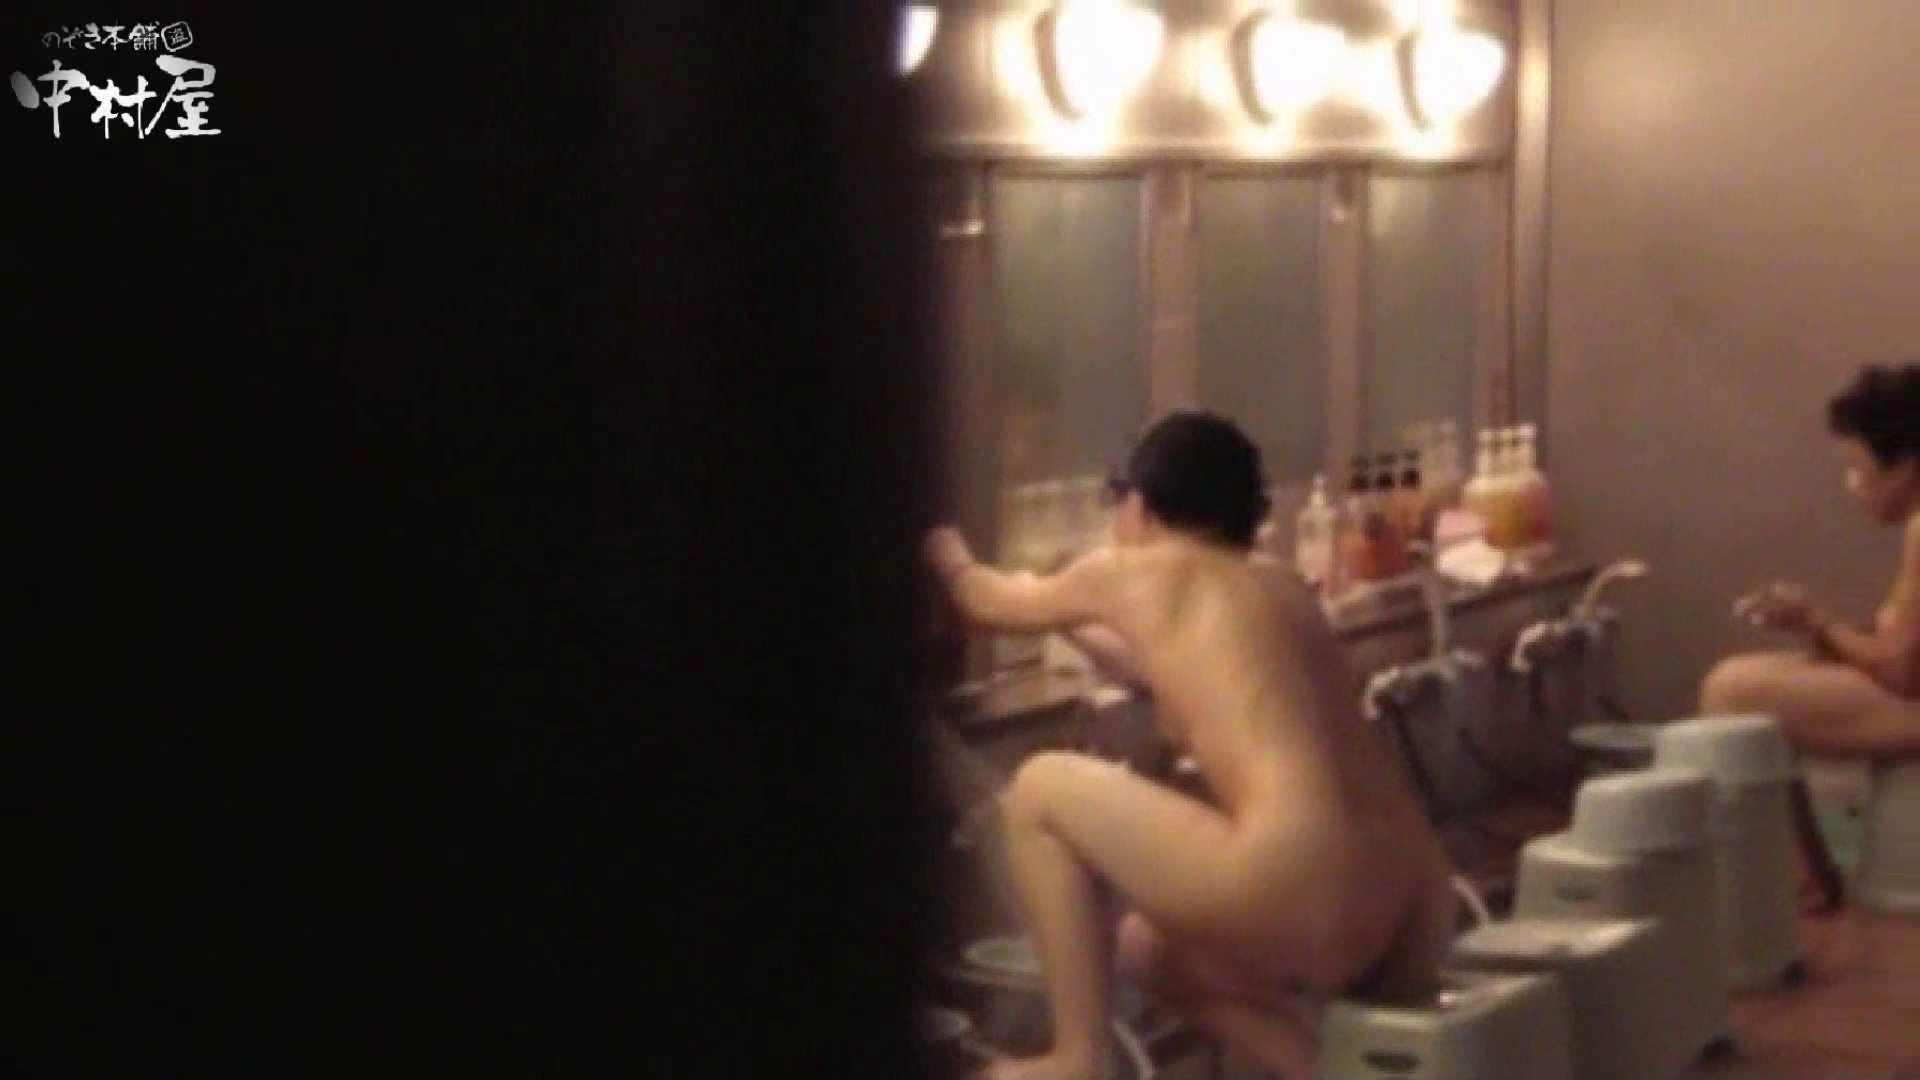 民家風呂専門盗撮師の超危険映像 vol.009 盗撮シリーズ セックス無修正動画無料 90PIX 62